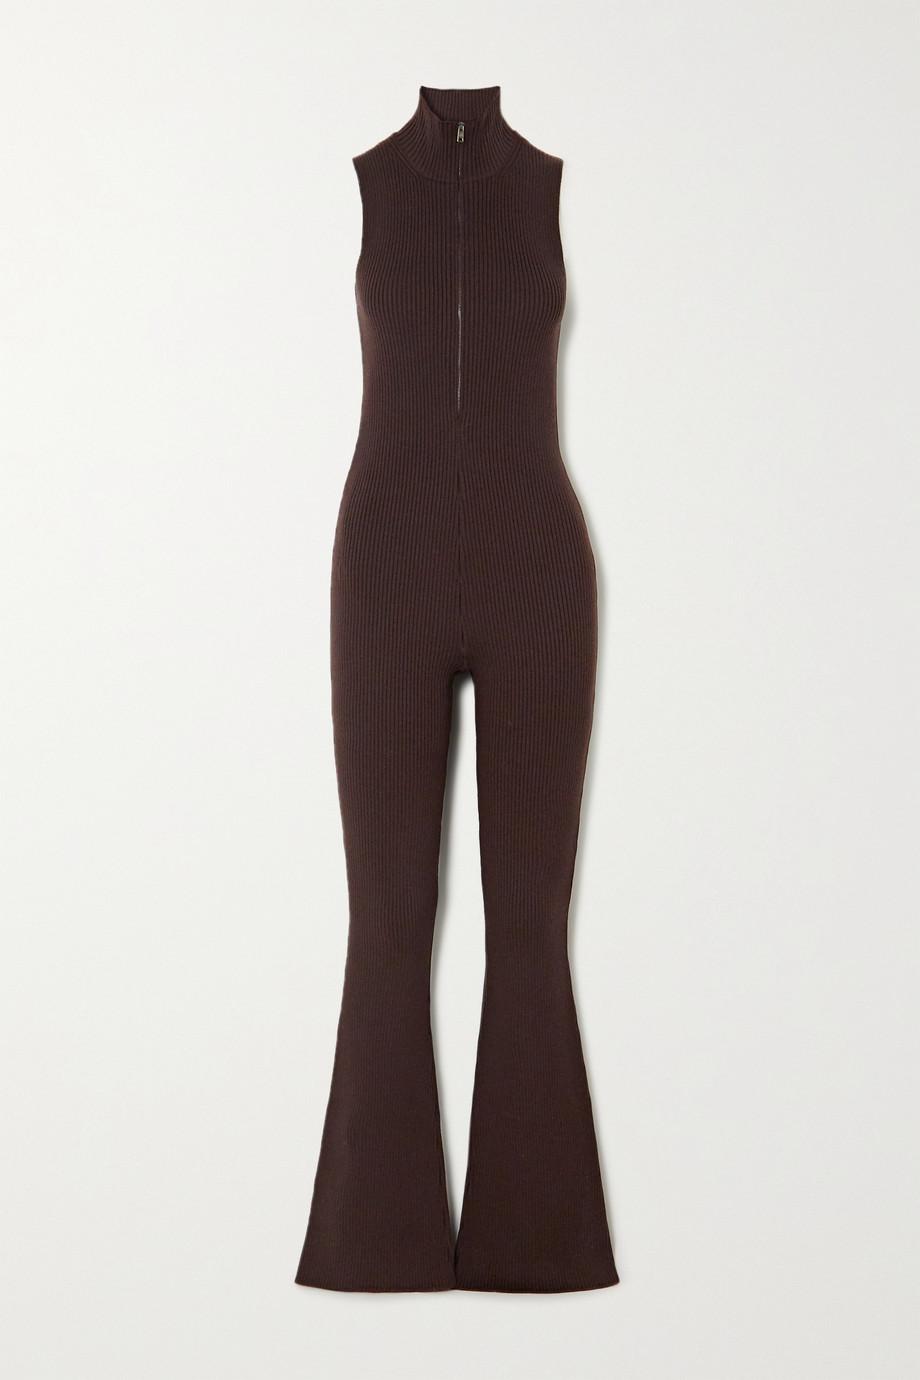 Prada Ribbed wool-blend jumpsuit